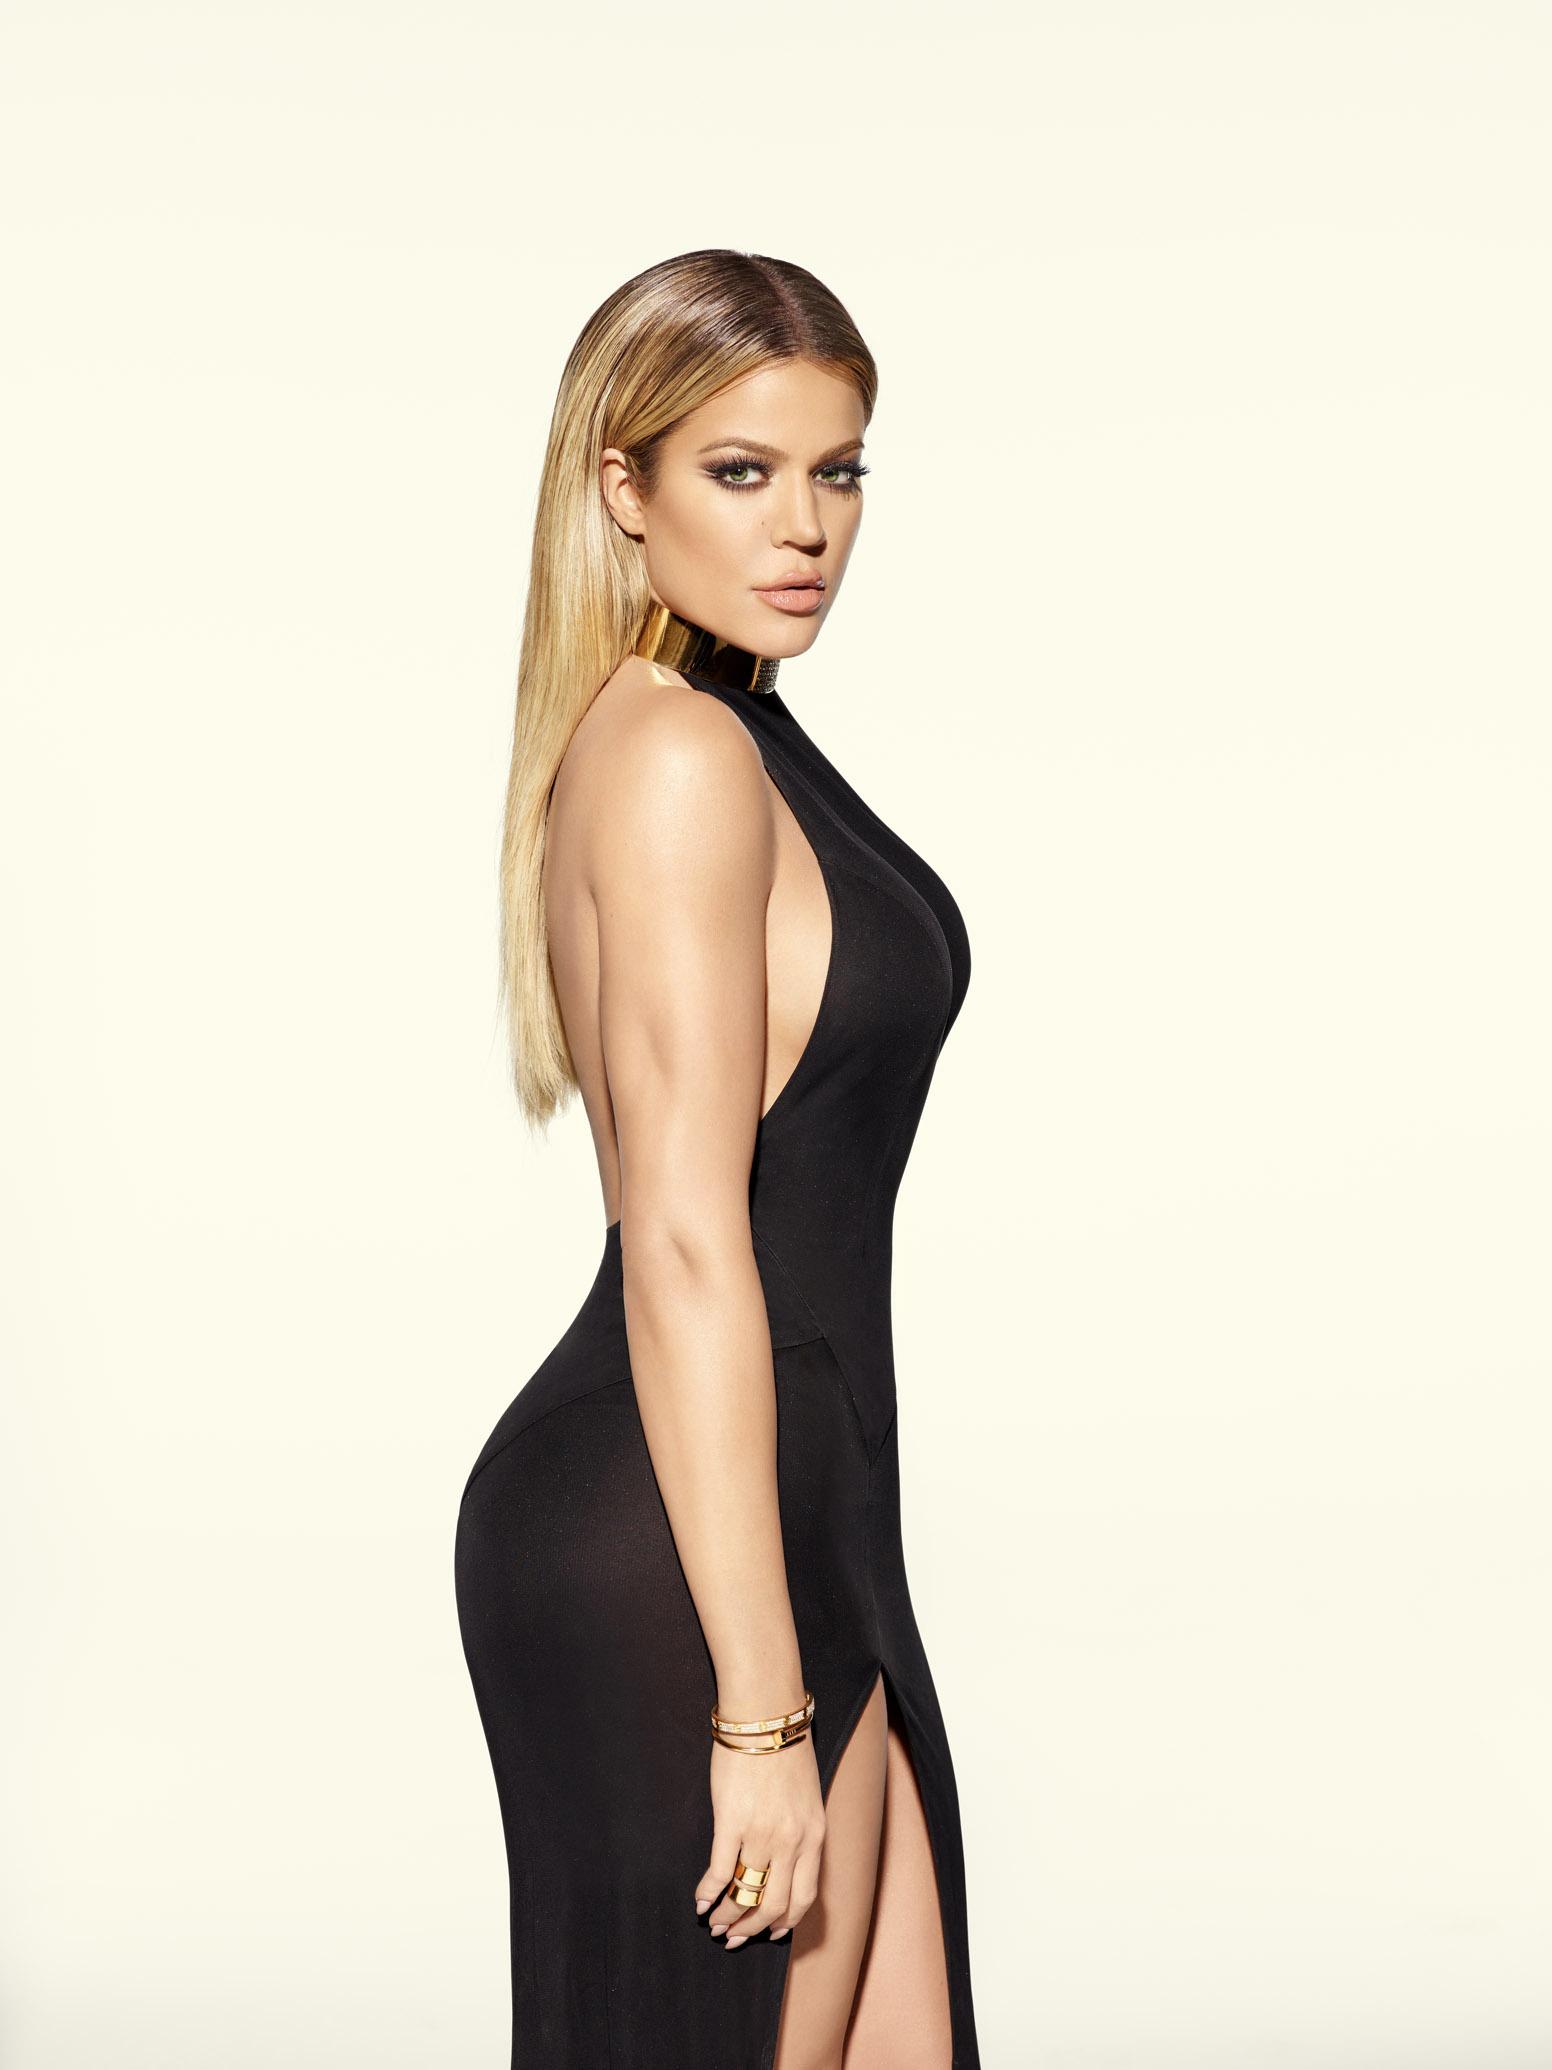 khloe kardashian pierde în greutate)